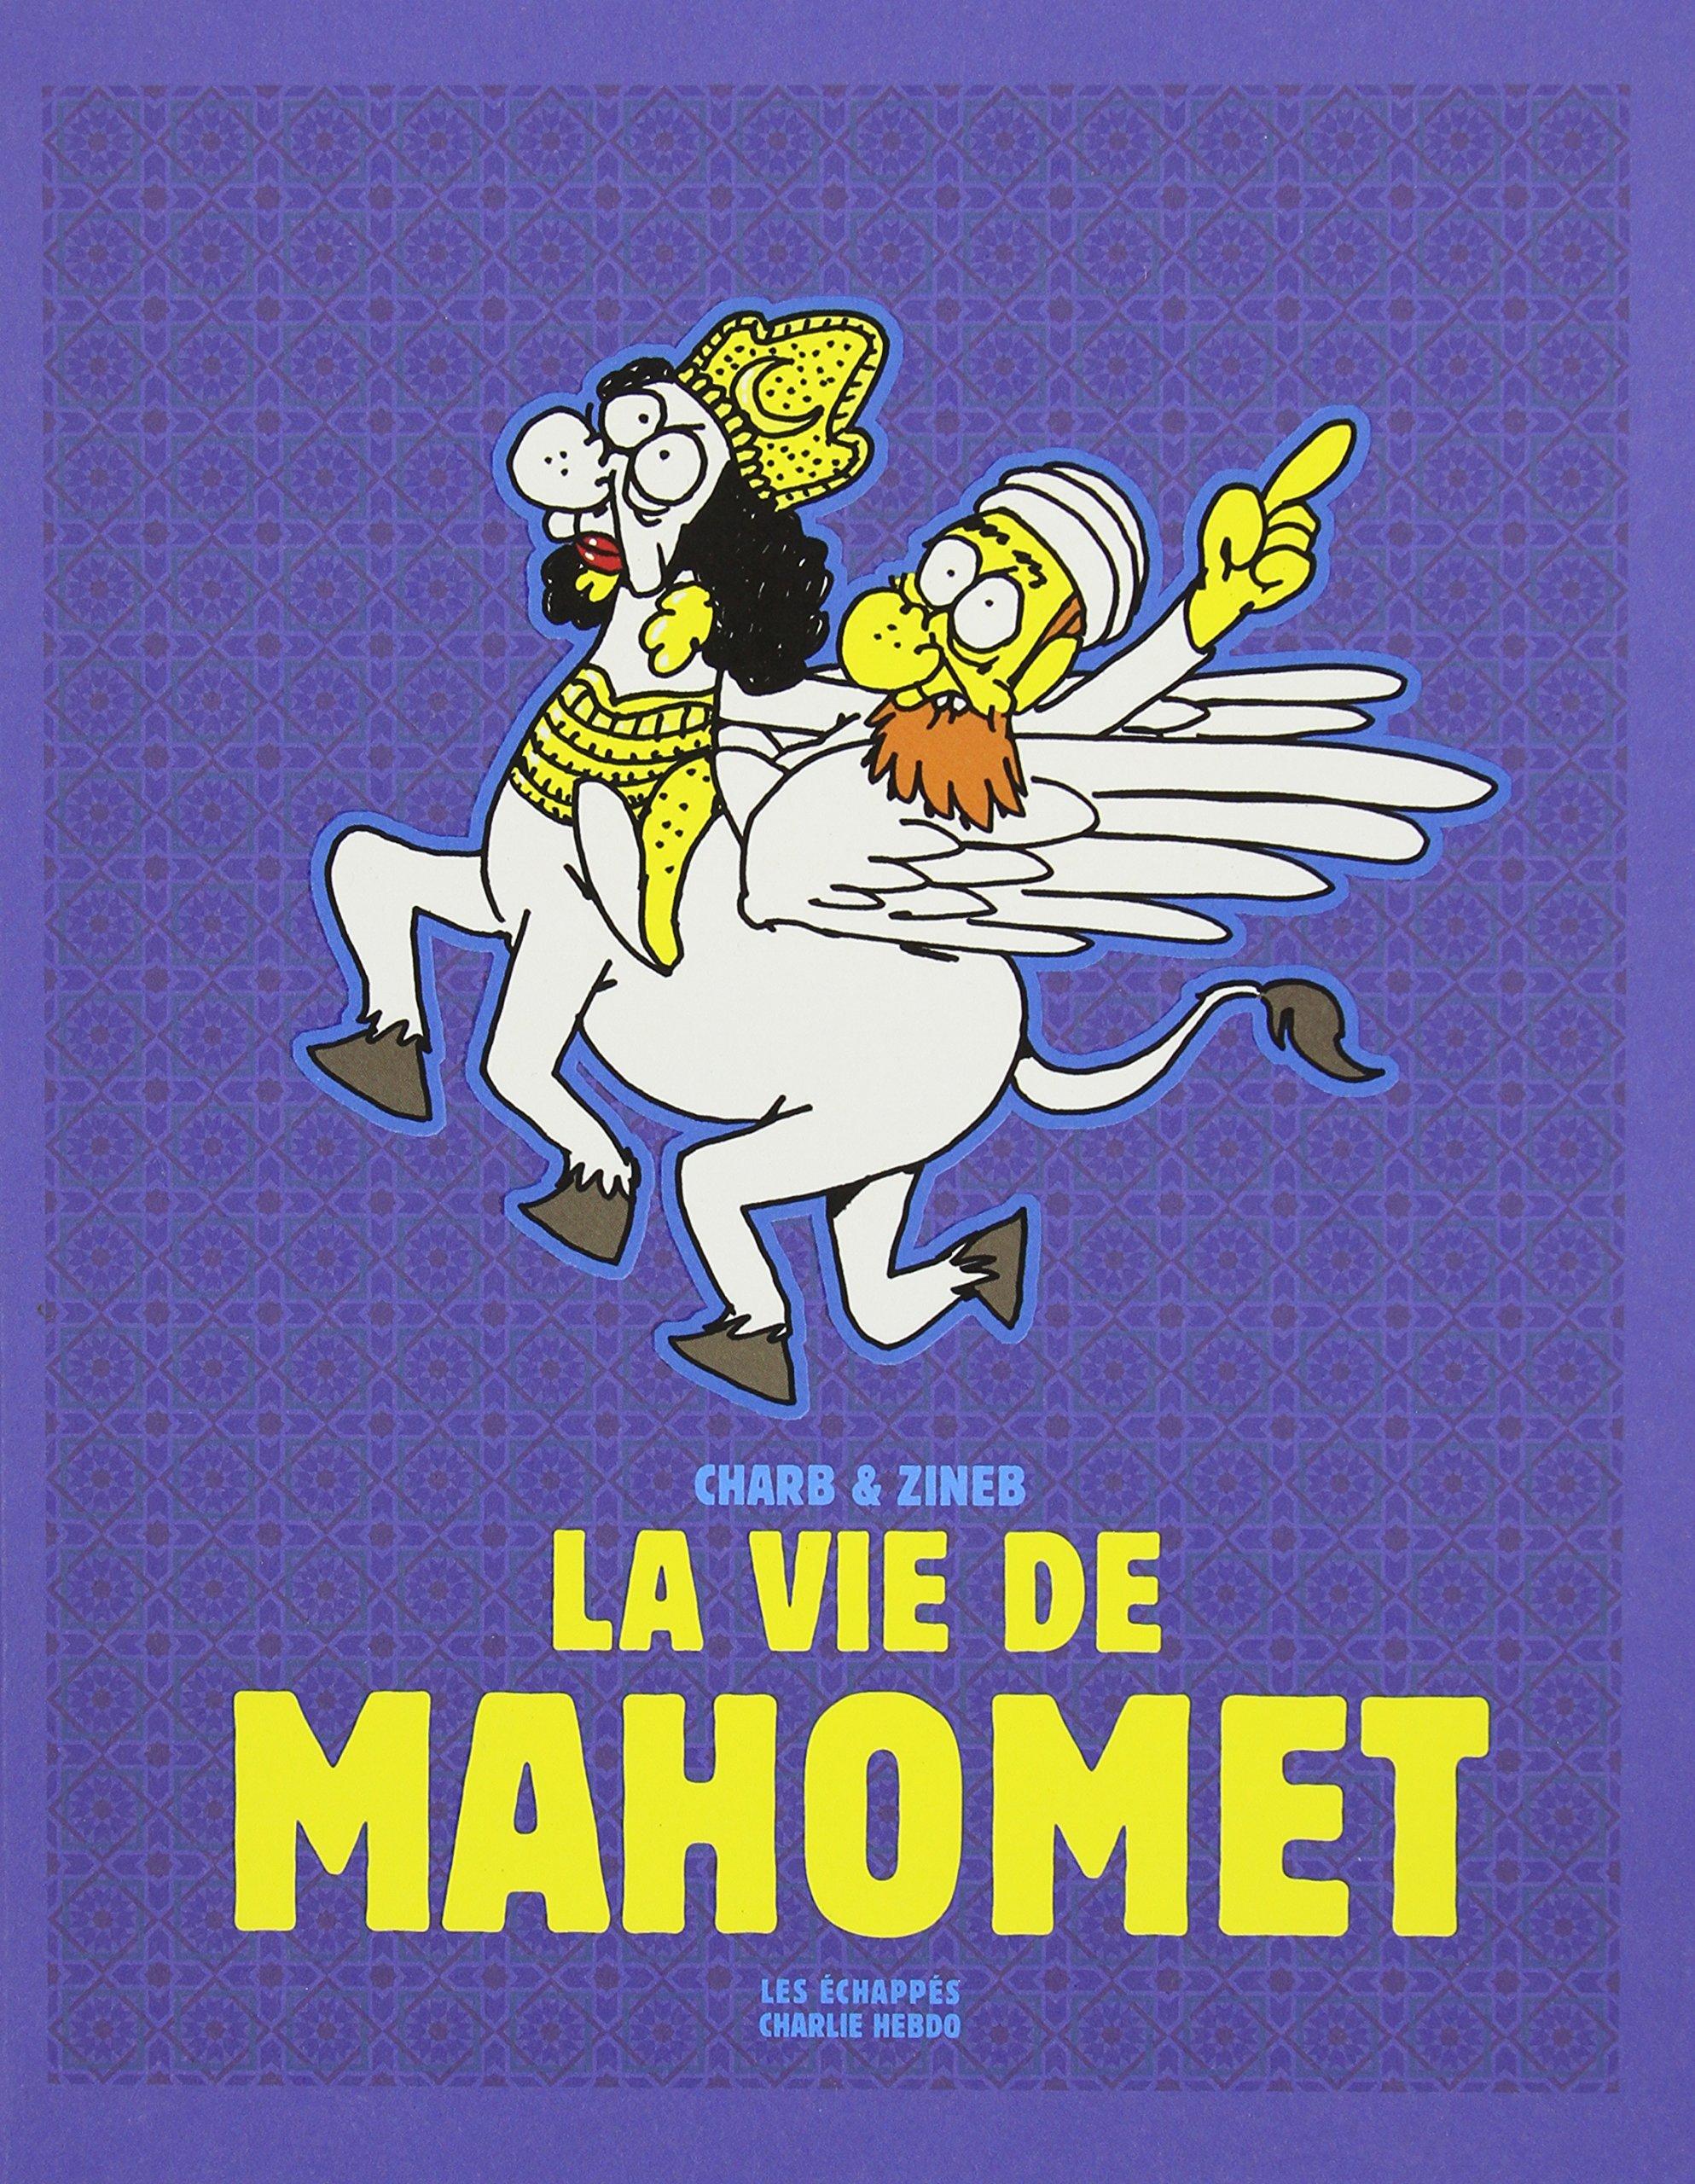 La Vie De Mahomet Hors Collection Bd French Edition Charb Zineb 9782357660649 Amazon Com Books